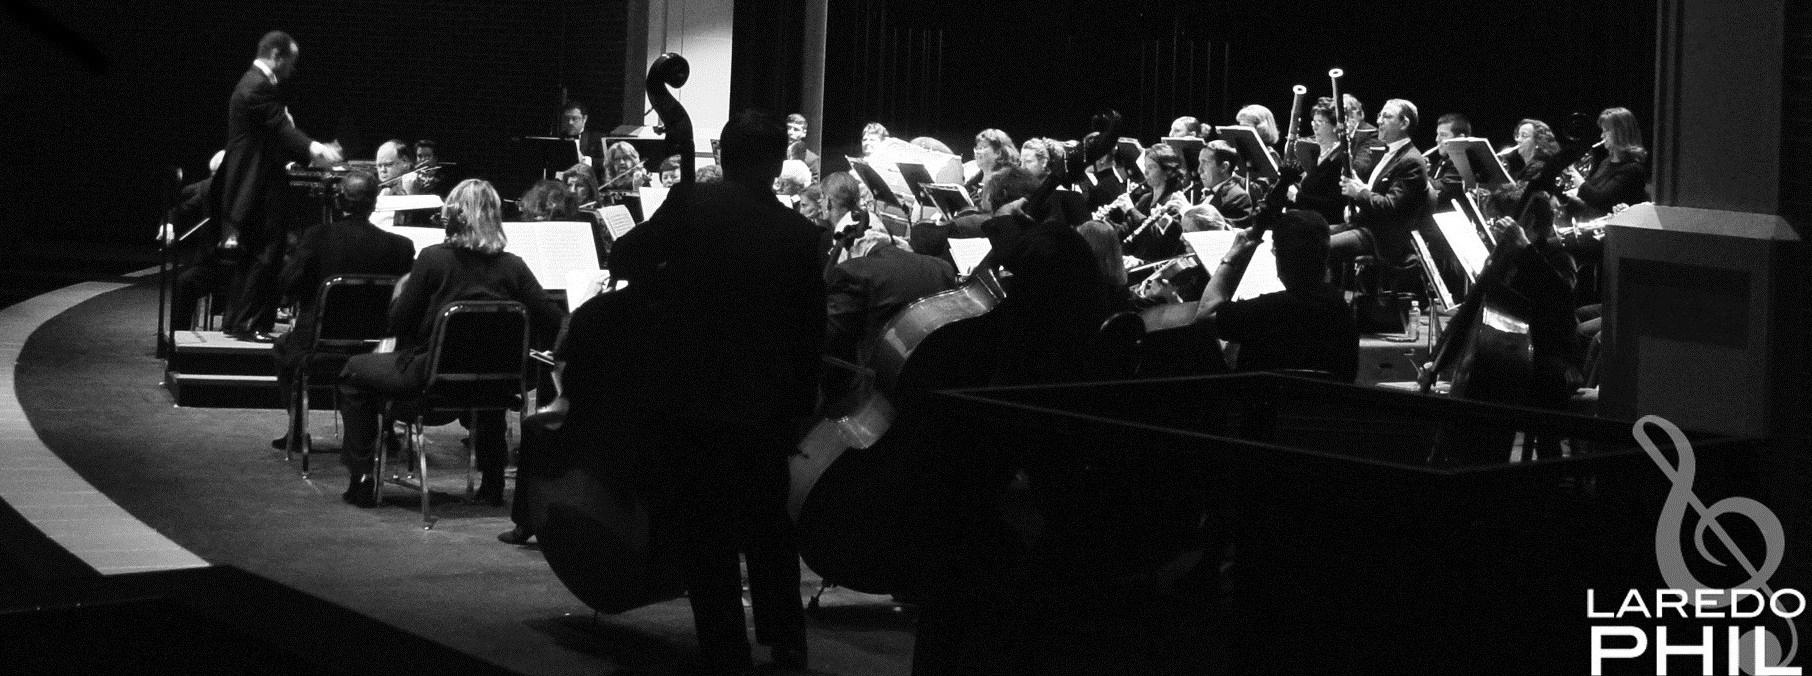 Laredo Philharmonic